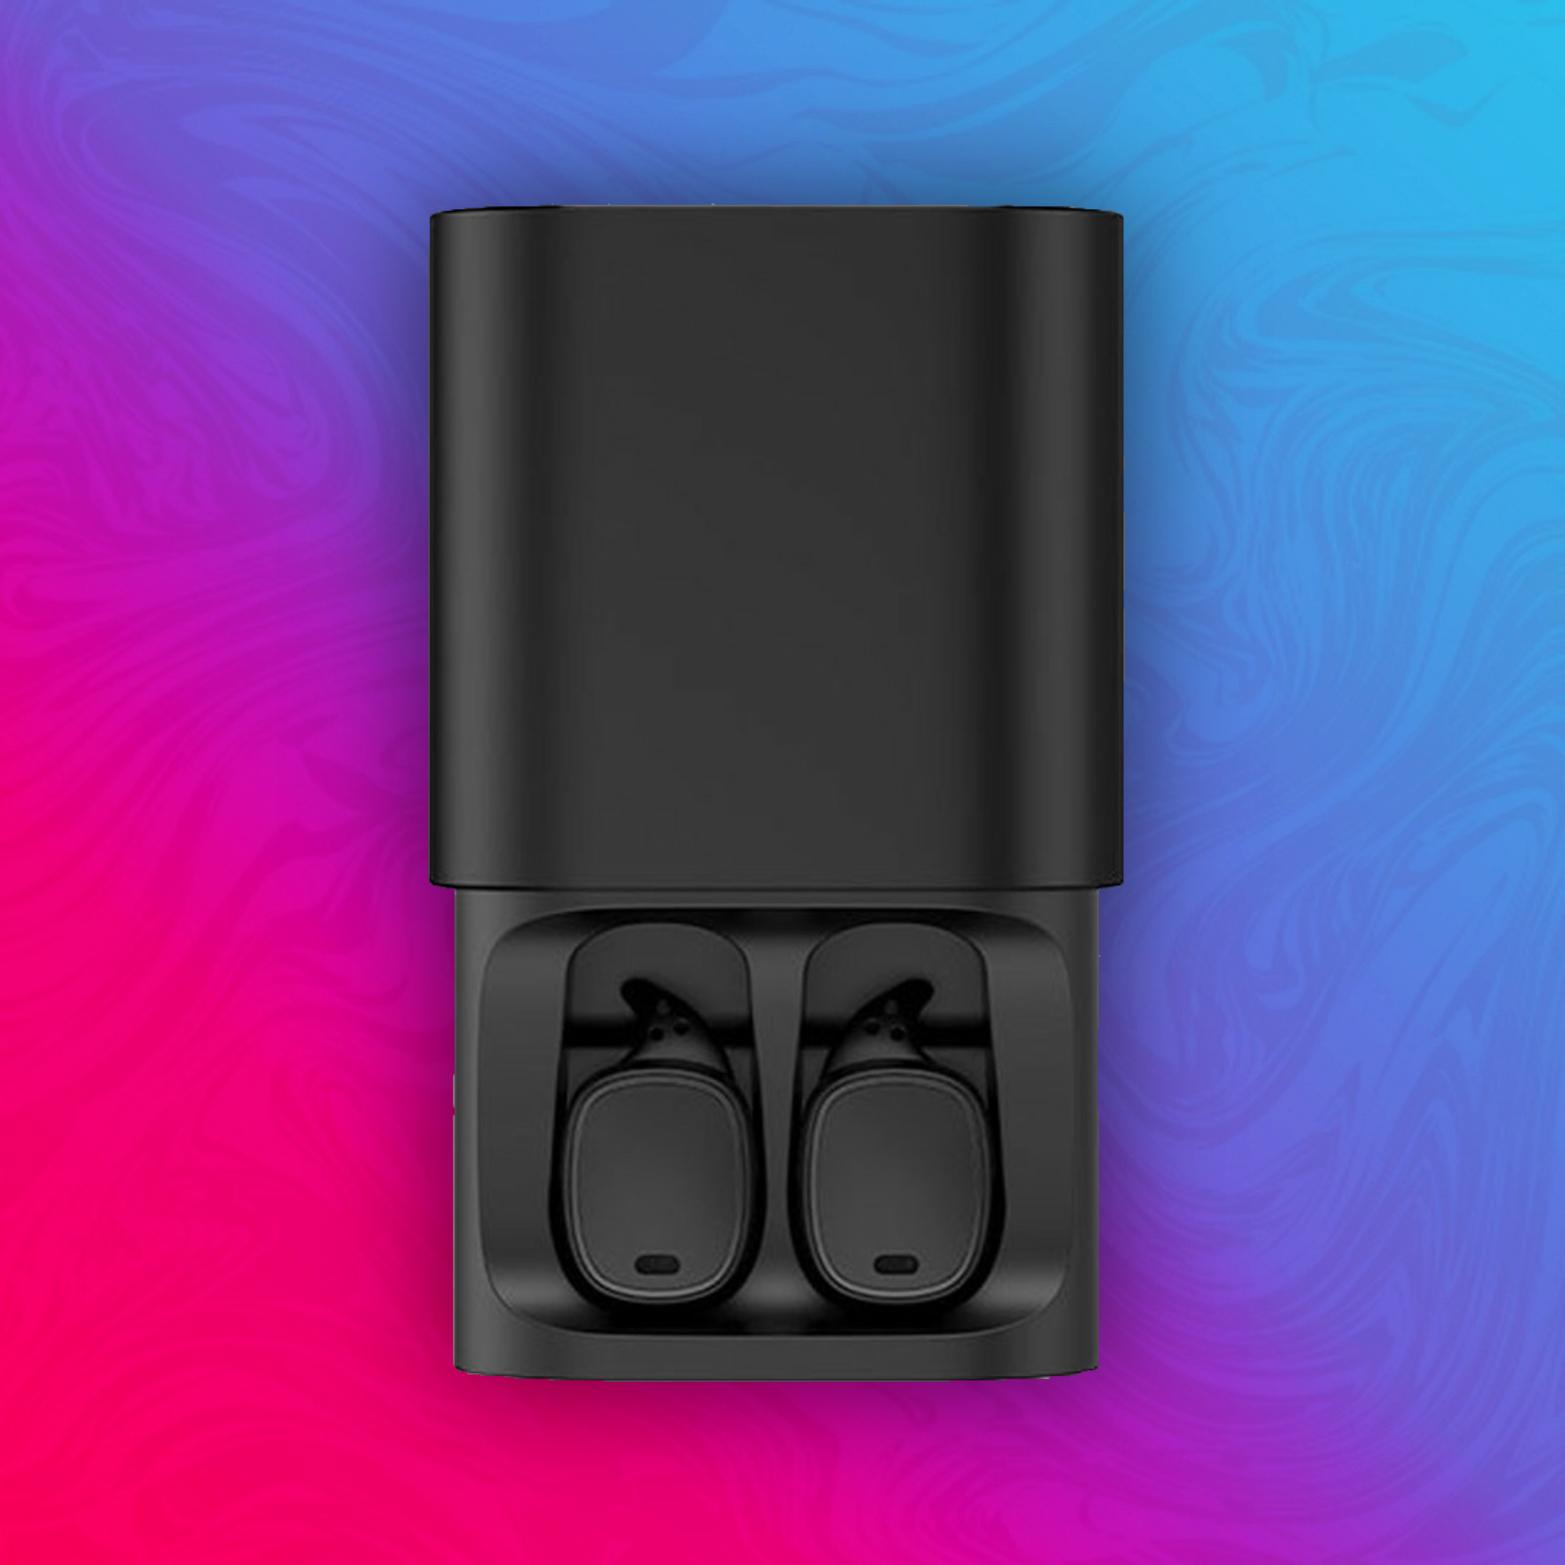 QCY T1 Pro - BT 4.2 Kopfhörer - iPX4 - 3D Stereo - 750mAh Ladebox - WiFi Synchronisation